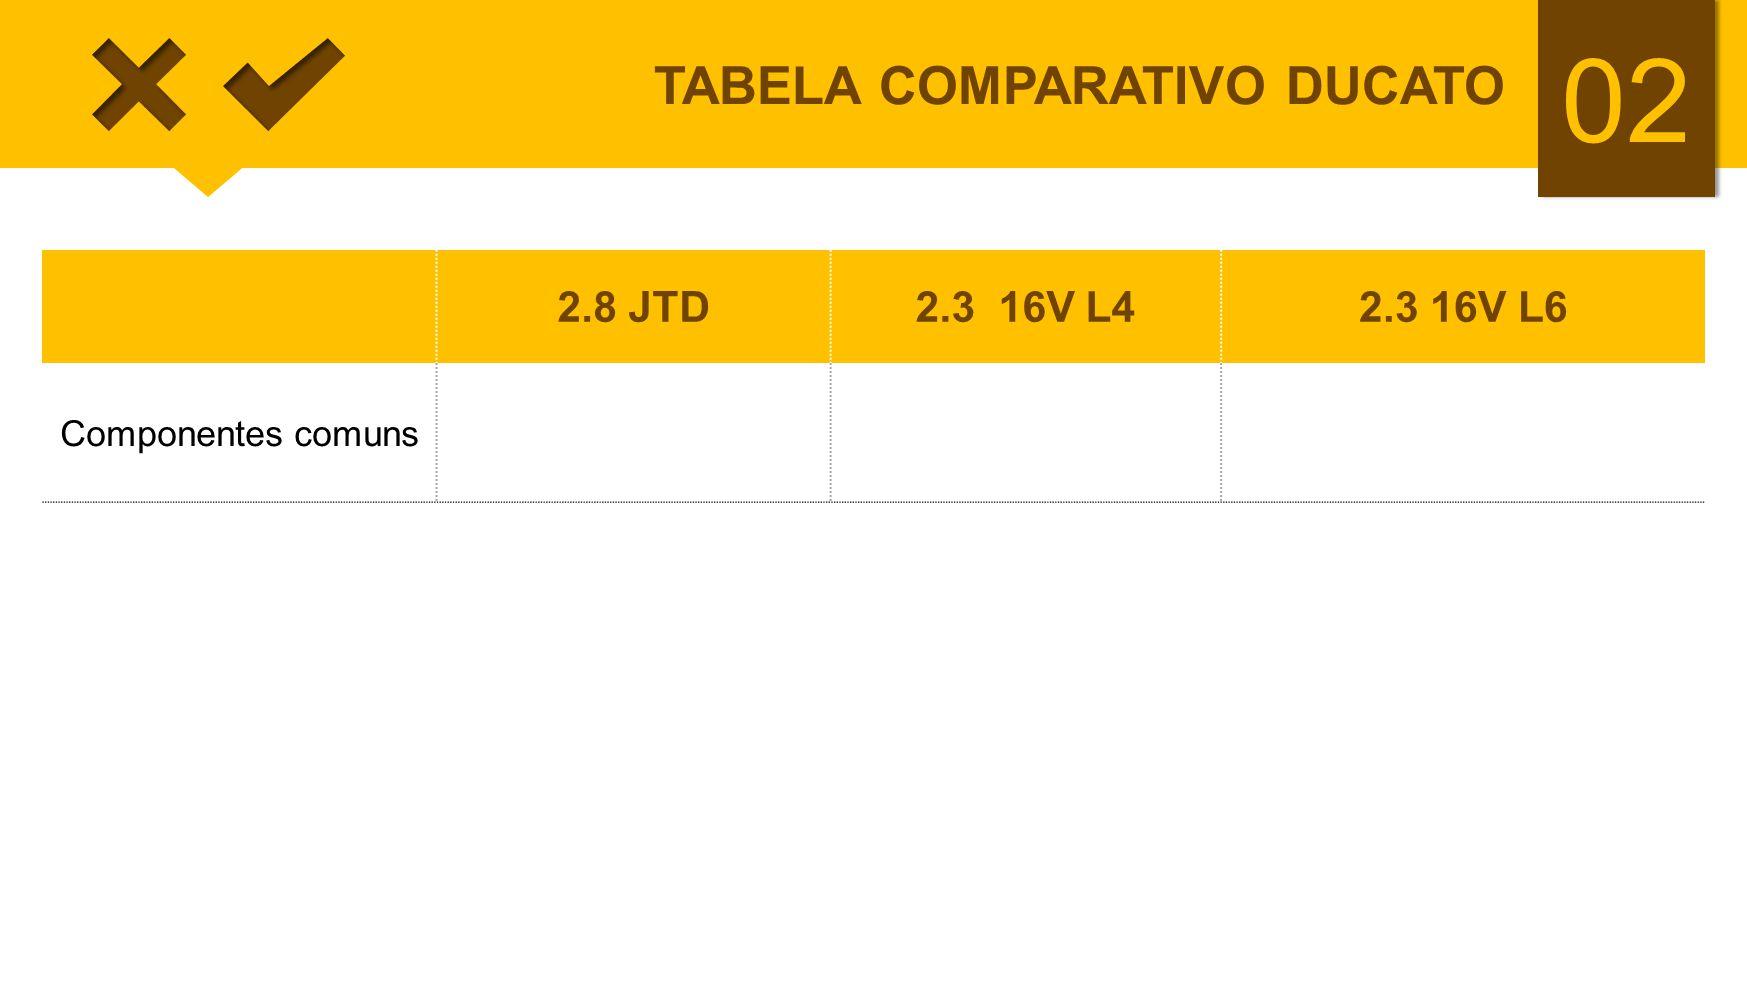 02 TABELA COMPARATIVO DUCATO 2.8 JTD2.3 16V L42.3 16V L6 Componentes comuns 2.8/L4/L6: Cambio MLGU L6: Correia dentada, bronzinas, conjunto de embreag